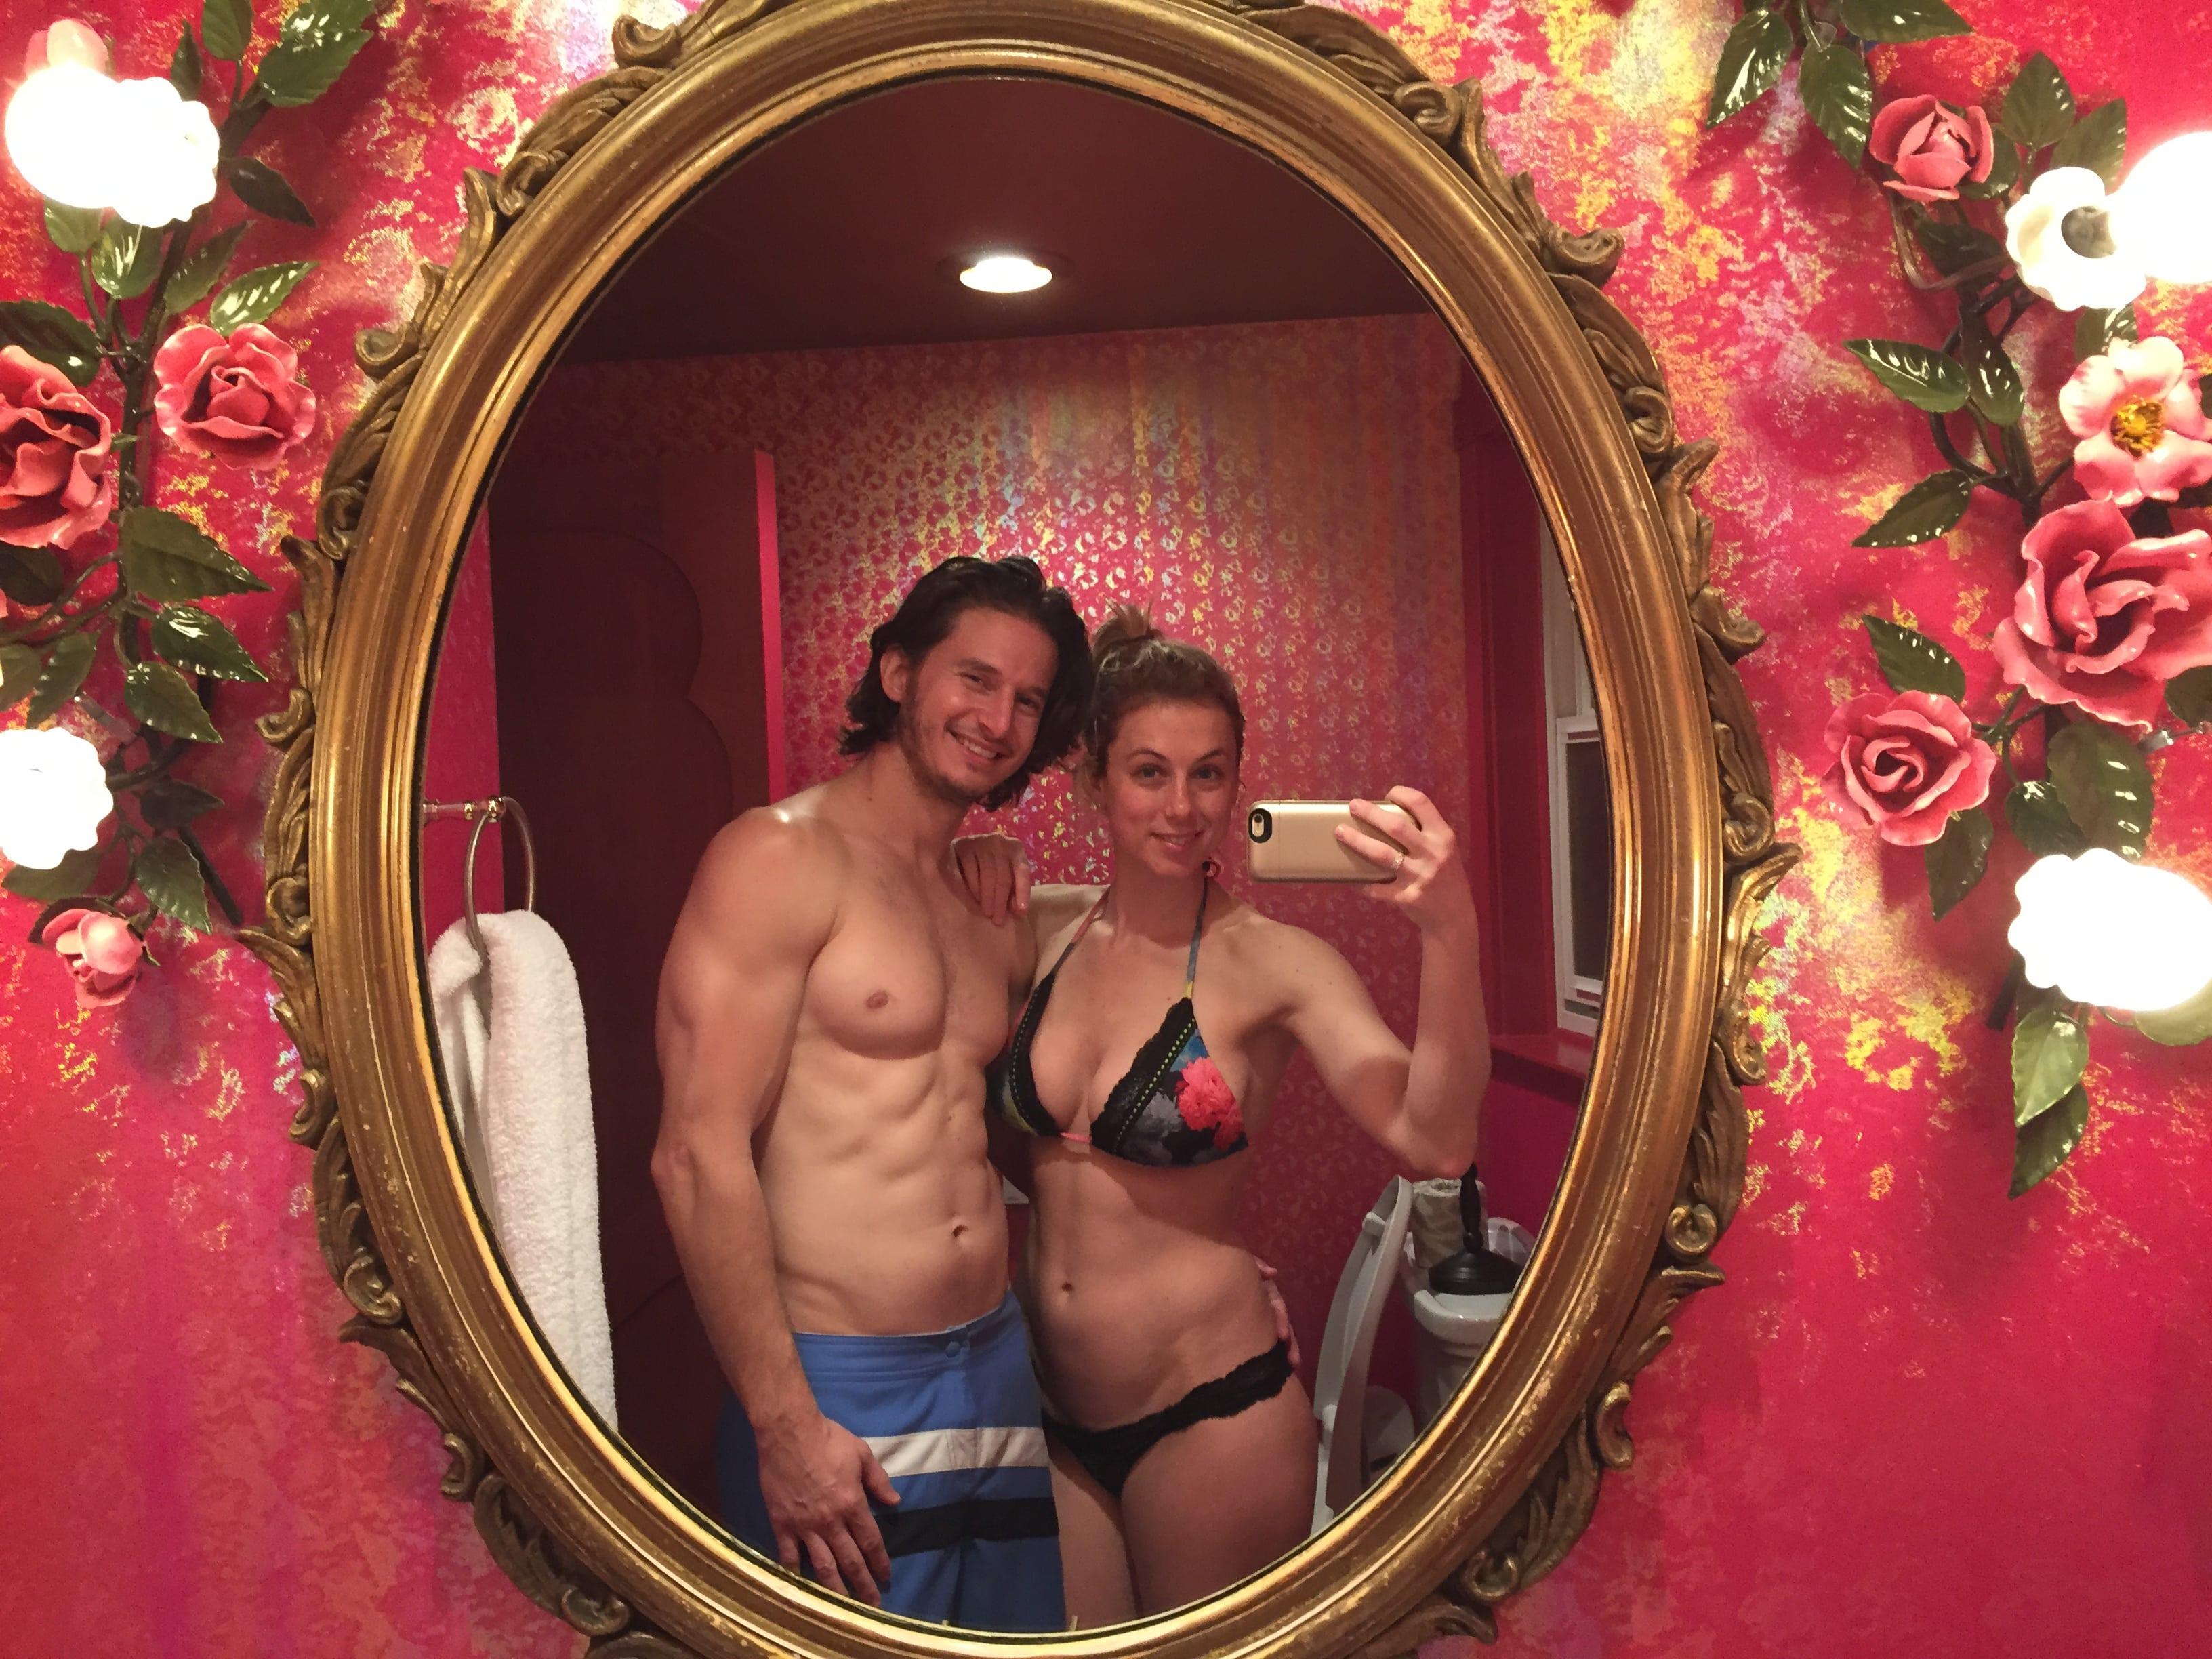 Micaela schaefer nude naked venus